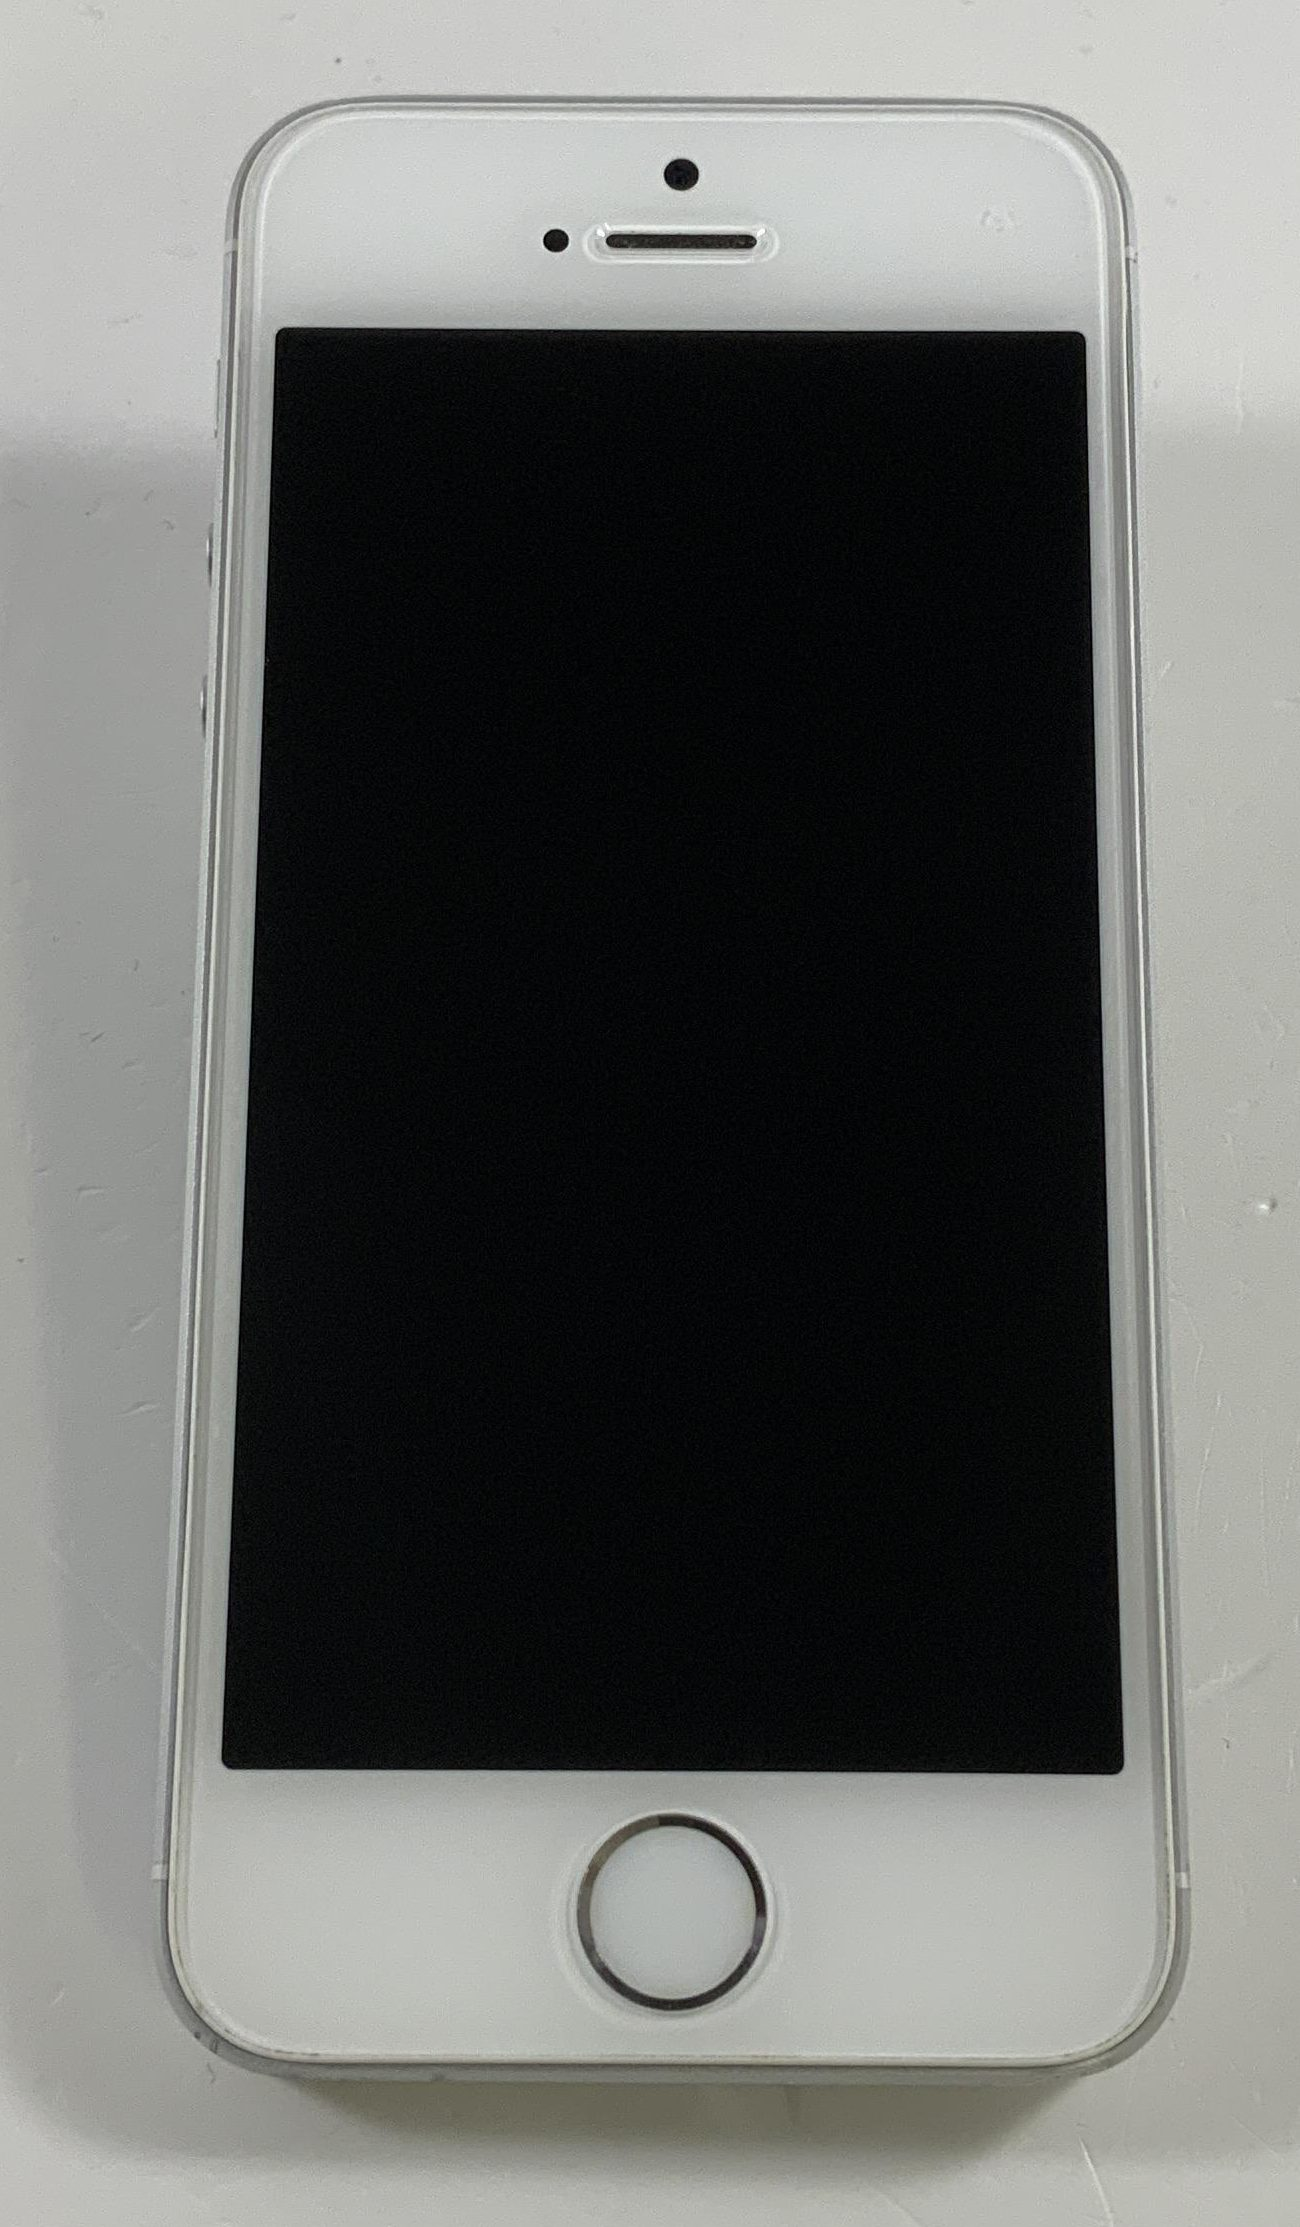 iPhone SE 16GB, 16GB, Silver, Bild 1